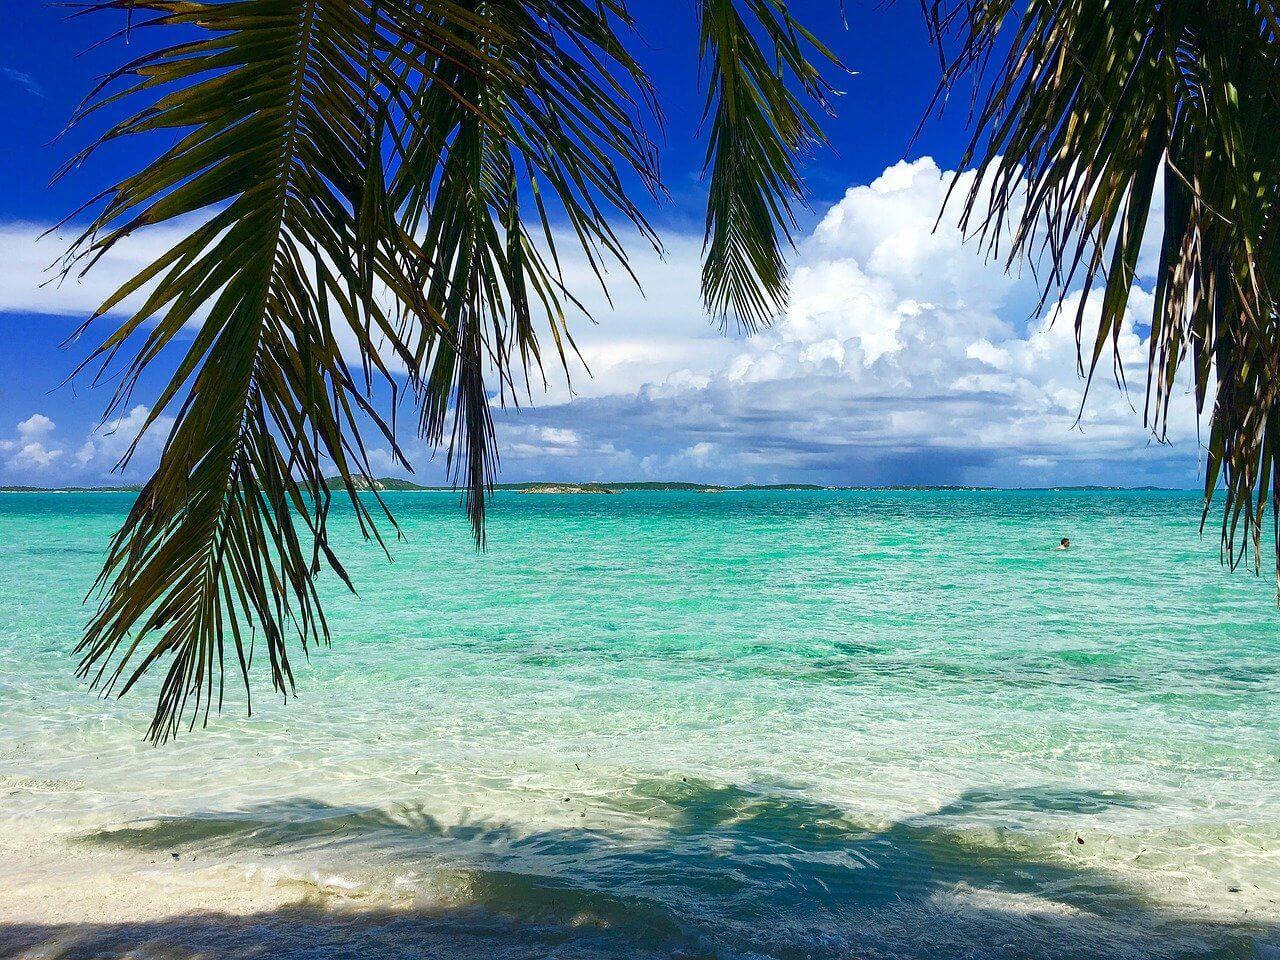 Bahamas Beach View